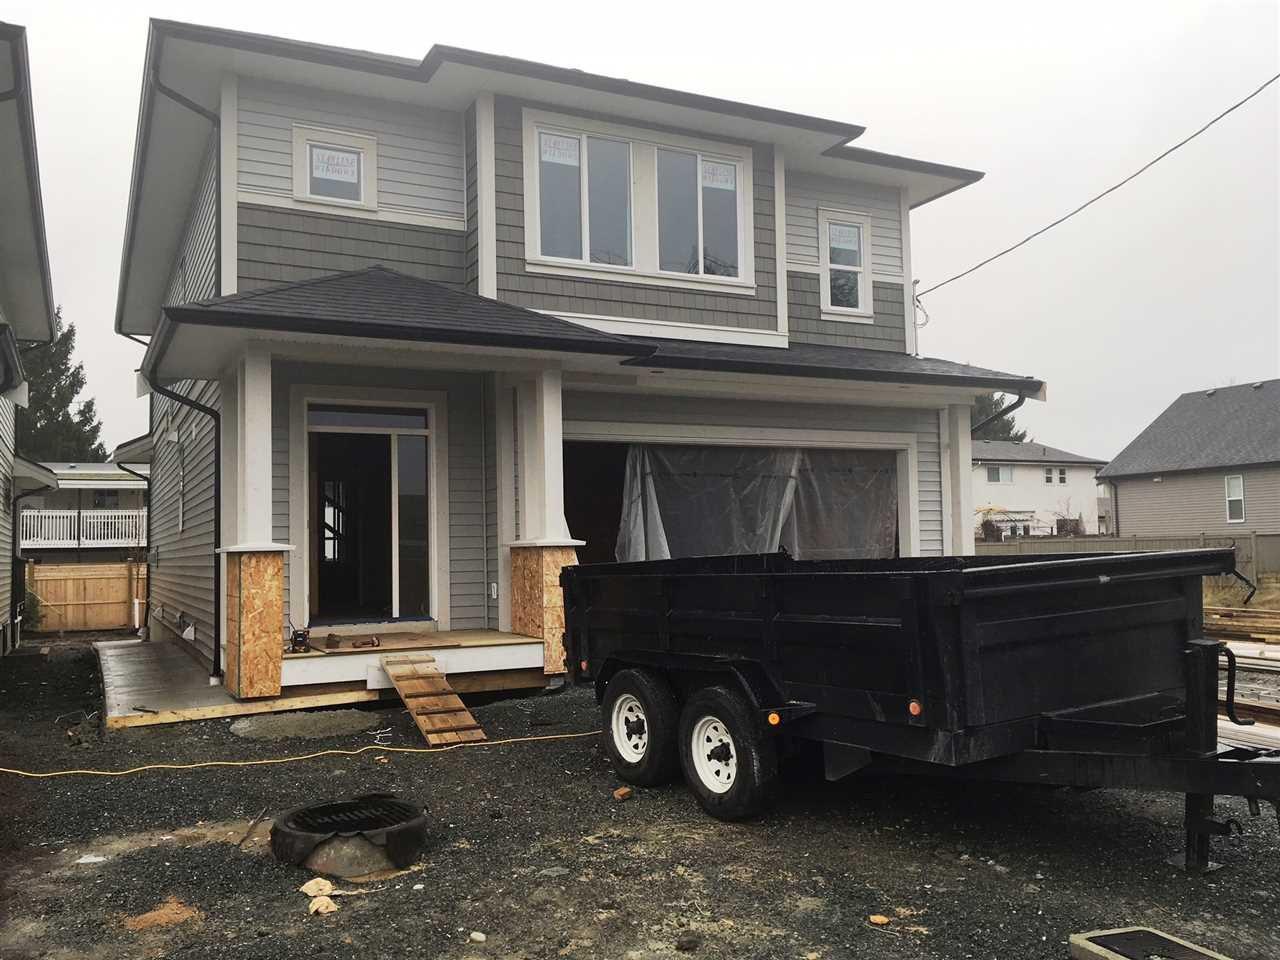 Main Photo: 6466 EVANS Road in Chilliwack: Sardis West Vedder Rd House for sale (Sardis)  : MLS®# R2334224